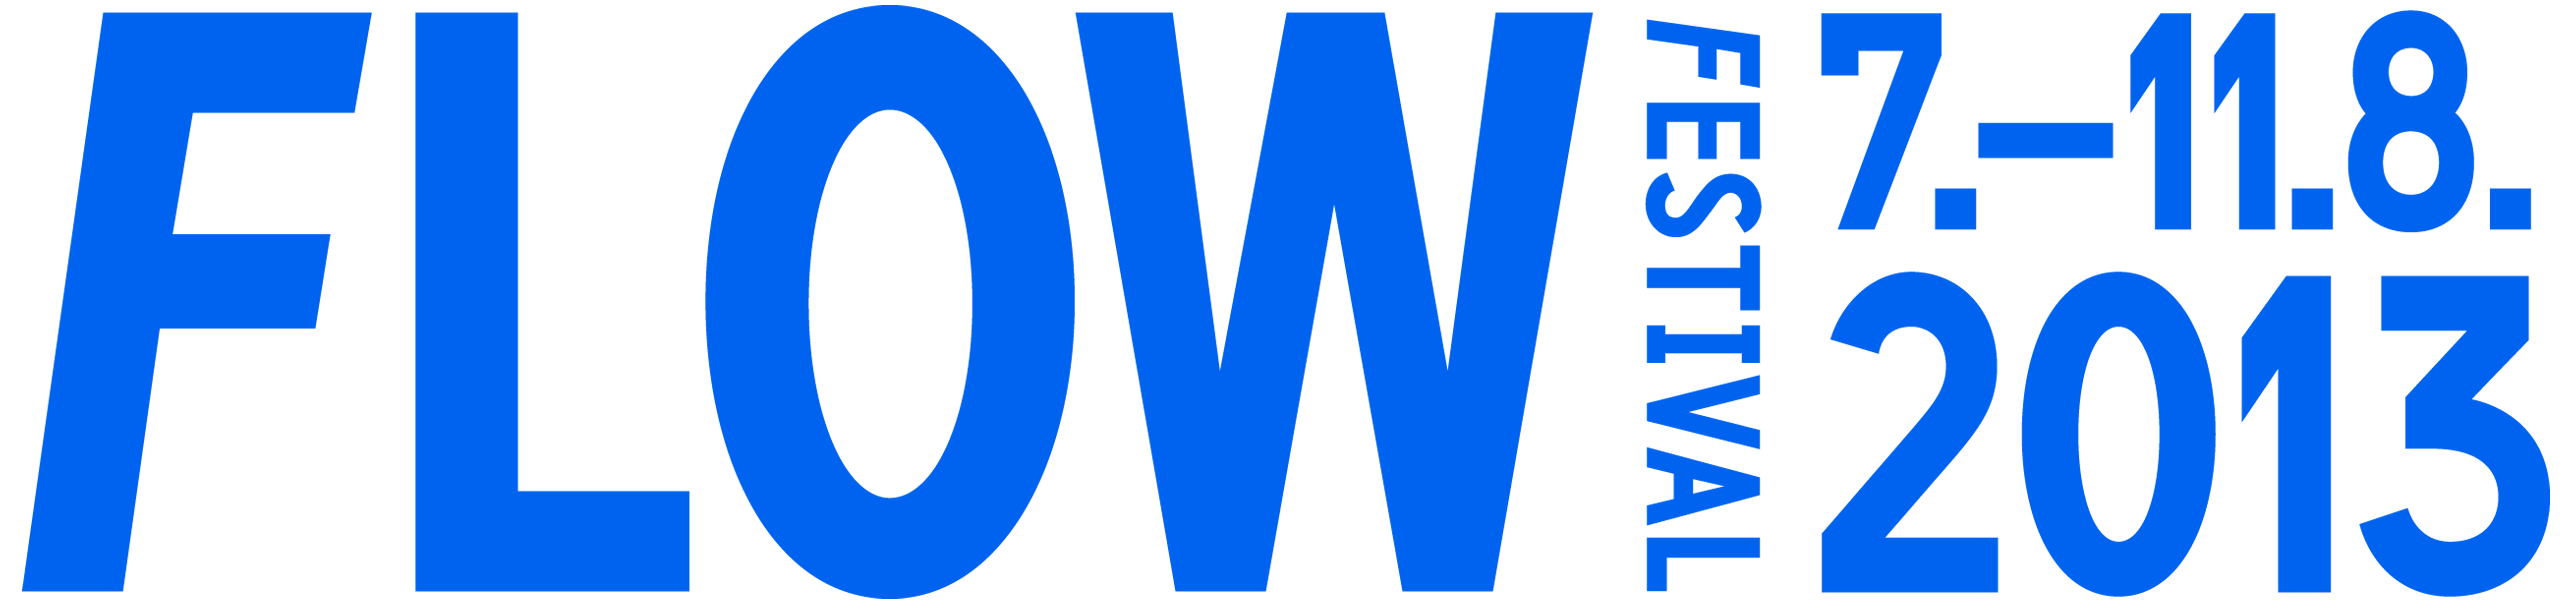 Flow 2013